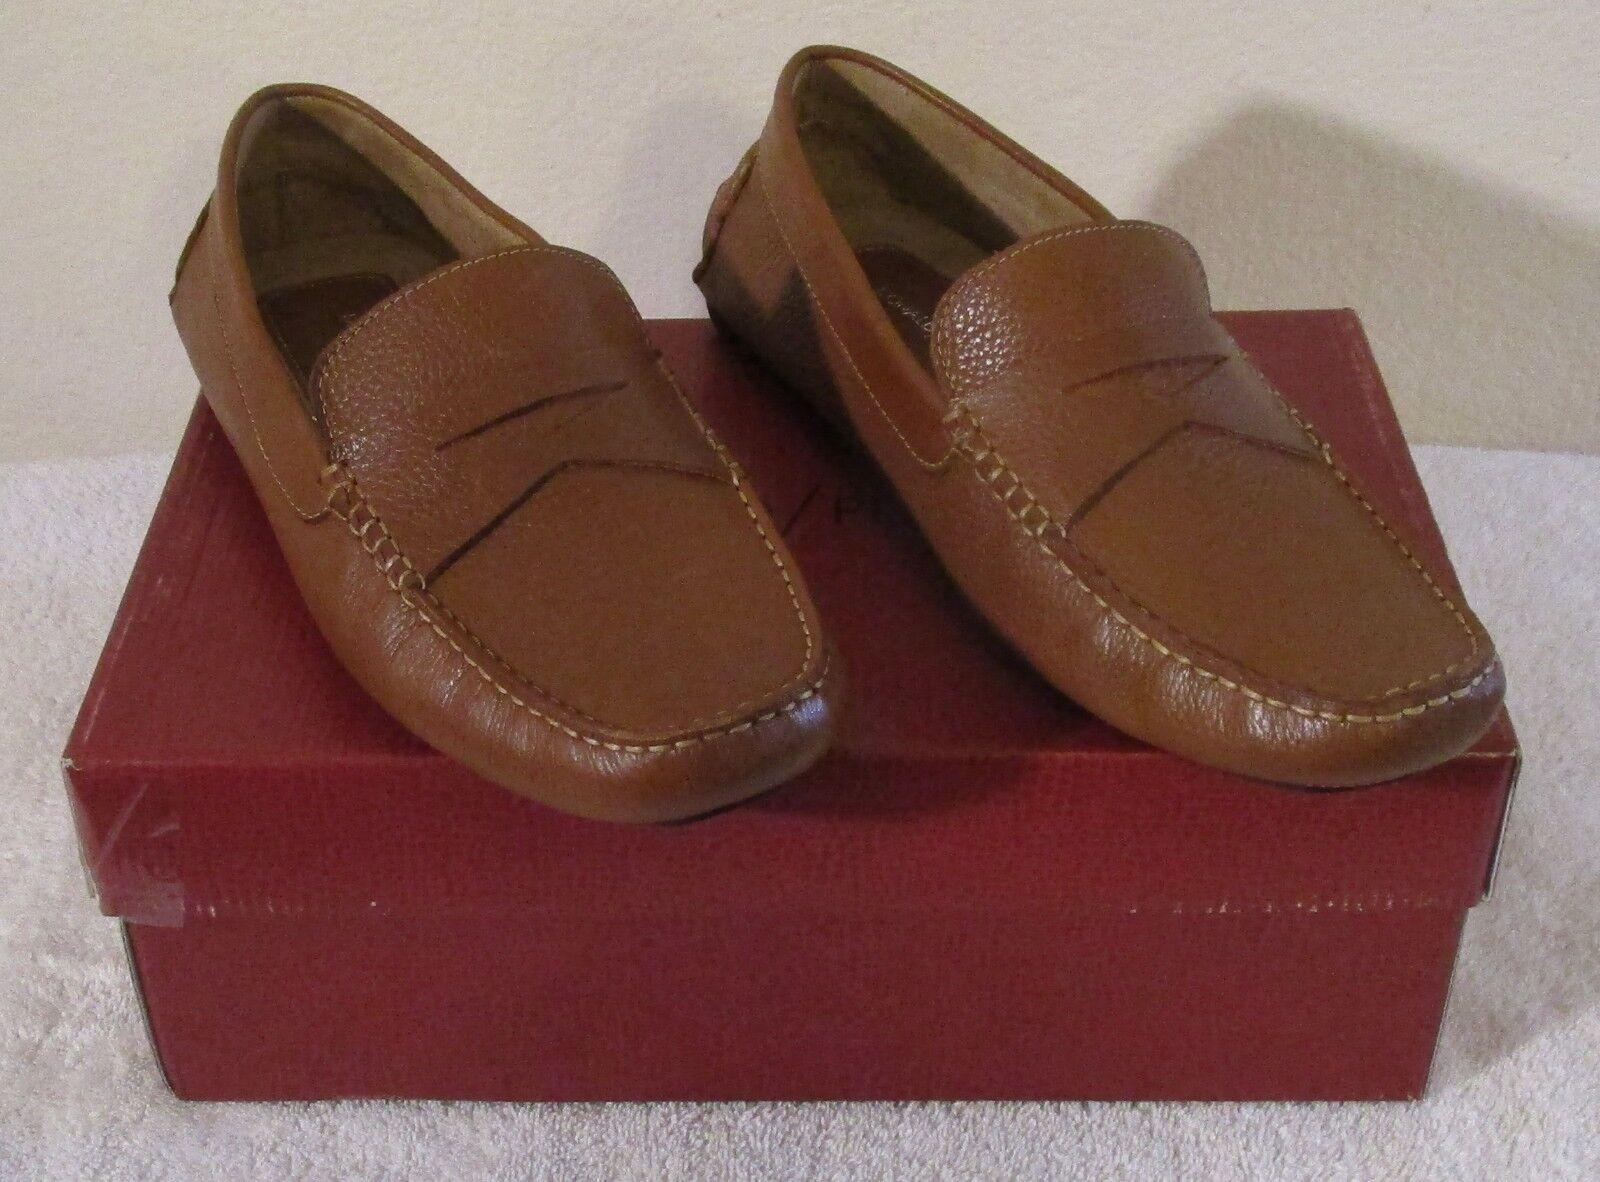 NIB Donald Pliner Alondro Uomo Penny Loafer Driving Mocs Shoes 11.5 Cognac  165